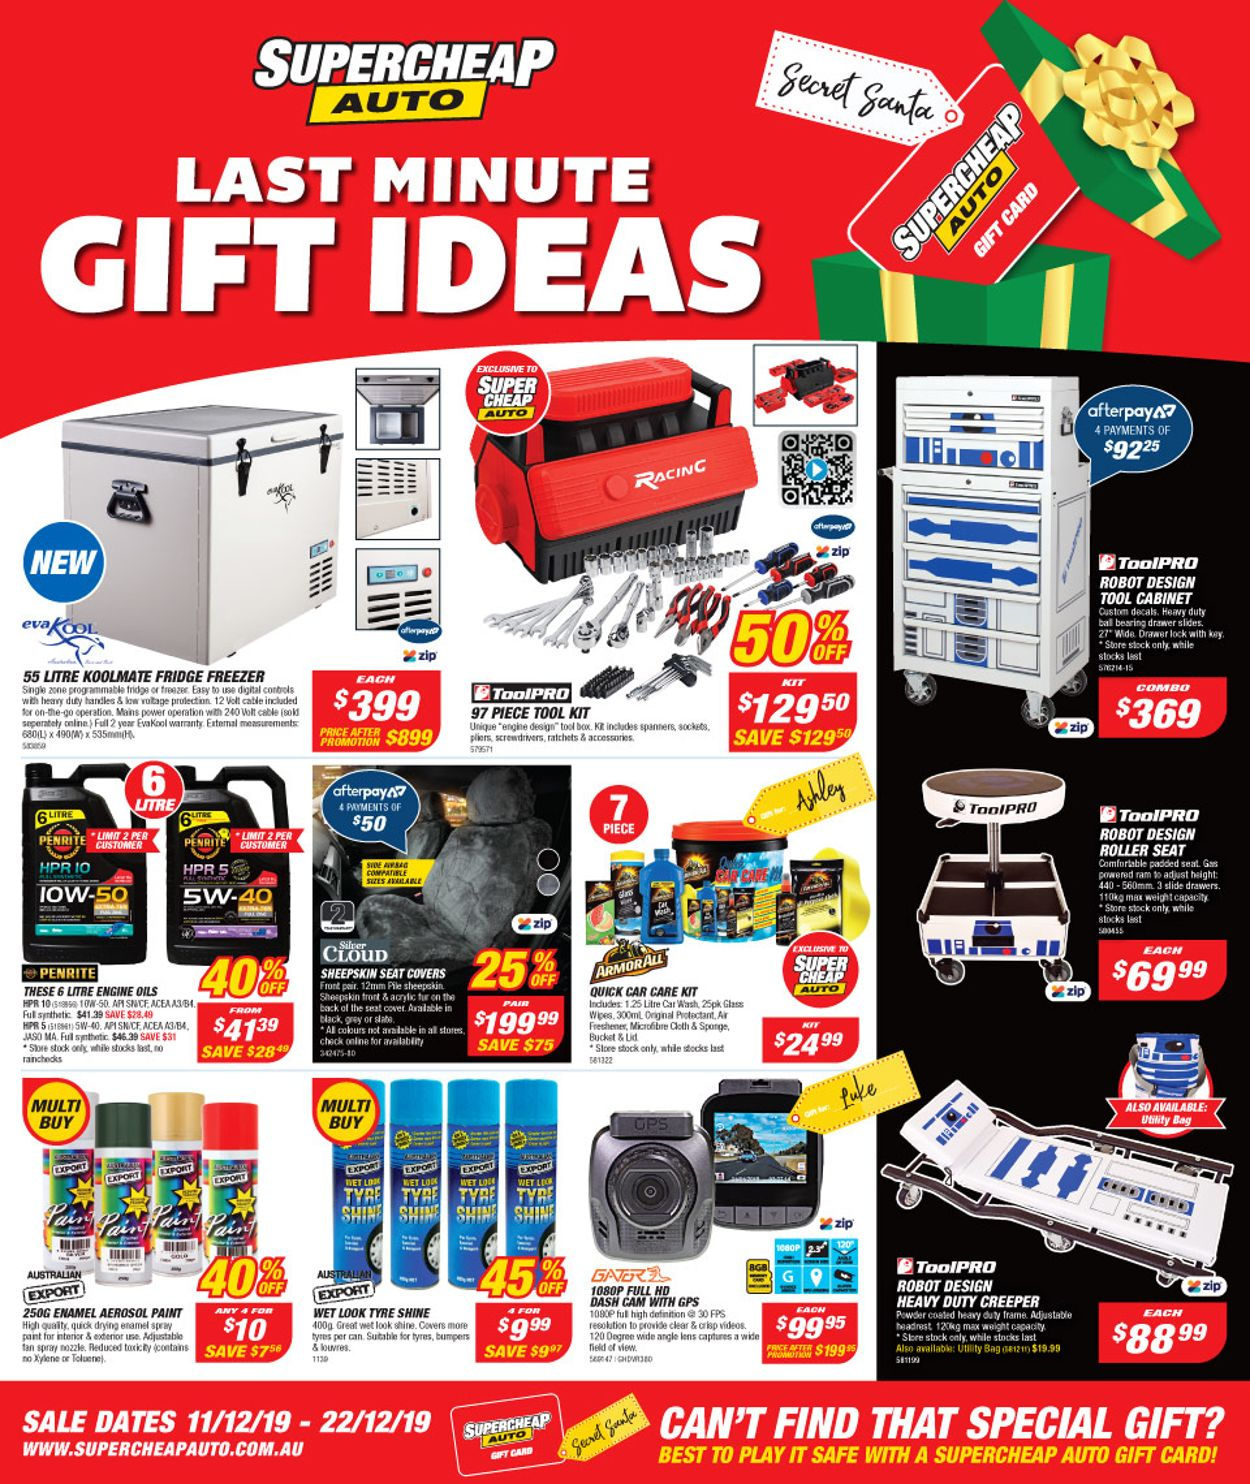 Supercheap Auto Christmas Catalogue 2019 Catalogue - 11/12-22/12/2019